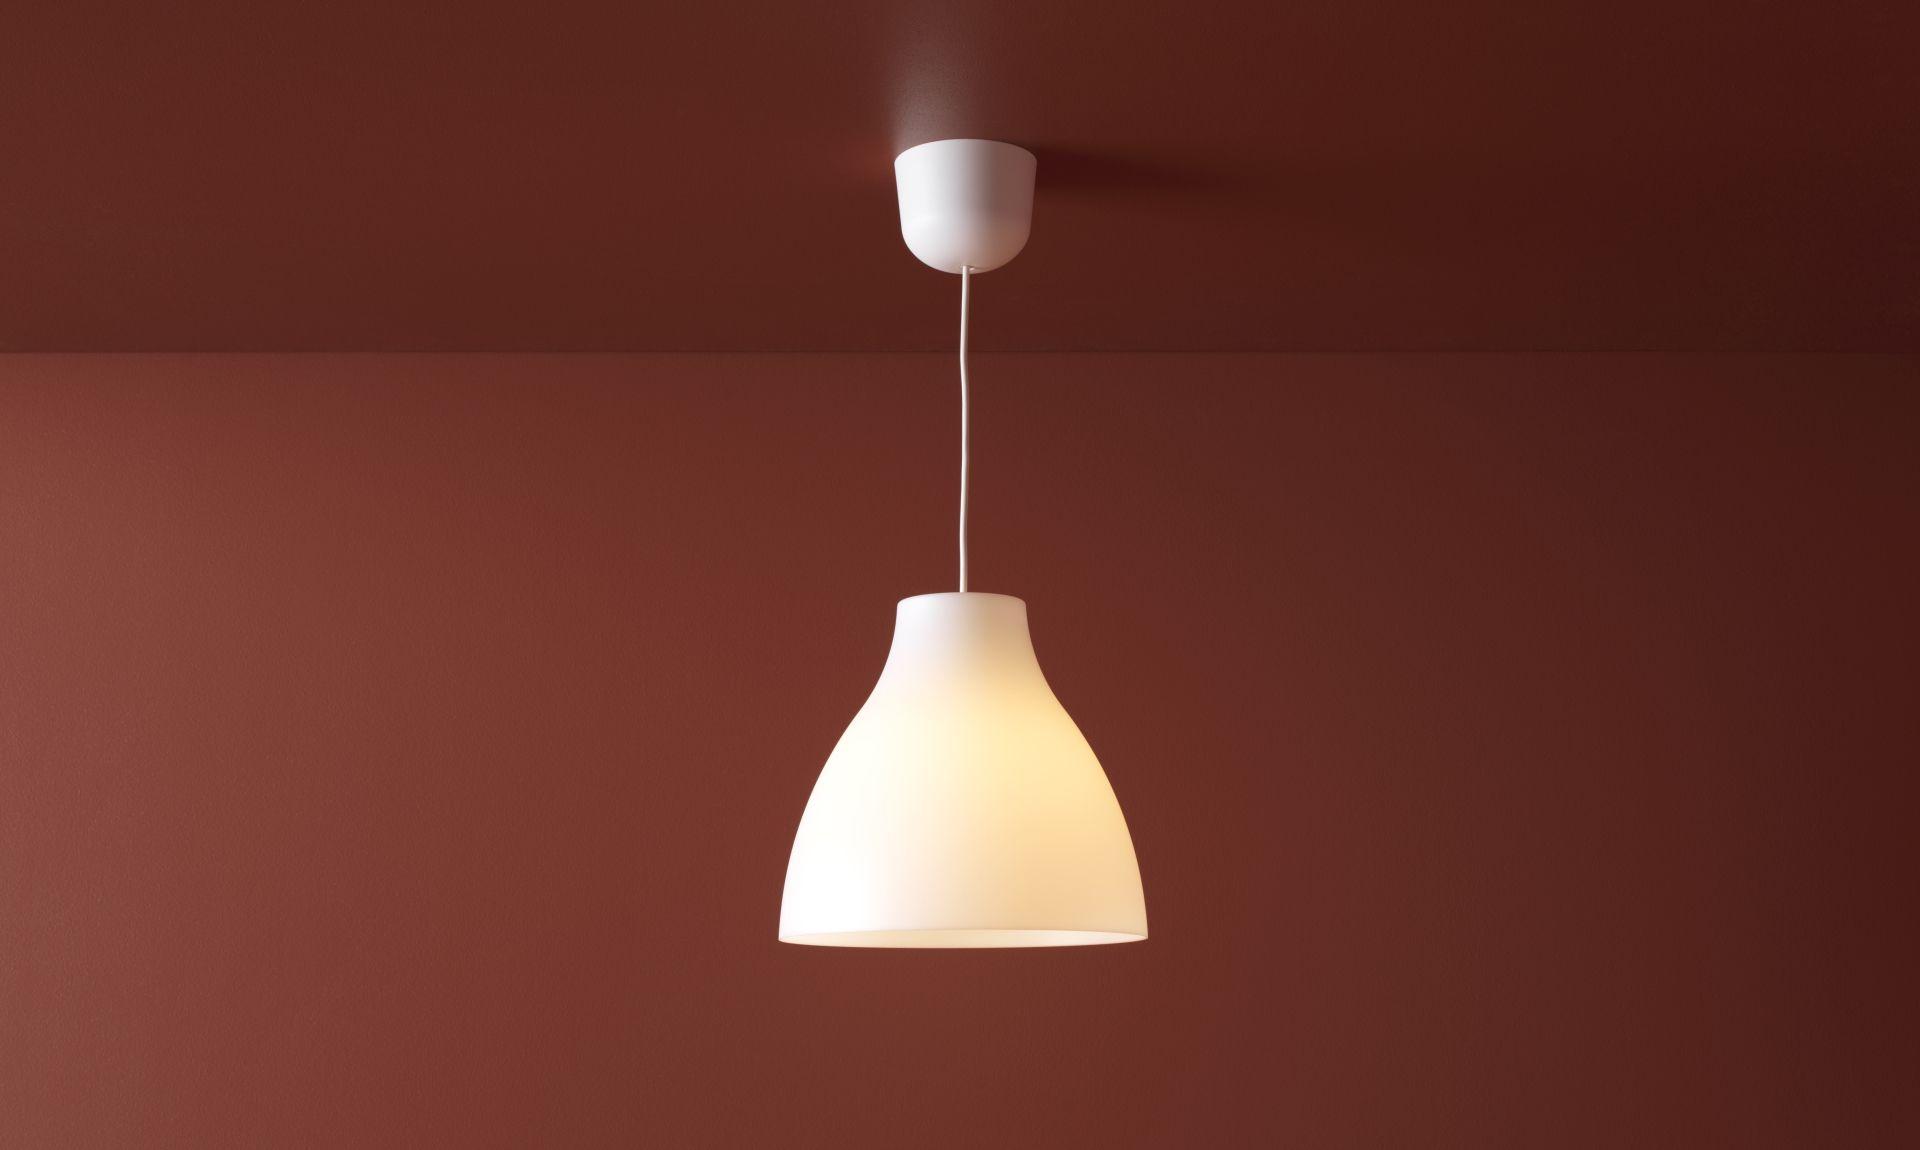 Verlichting Woonkamer Hanglamp : Melodi hanglamp ikeacatalogus nieuw ikea ikeanl